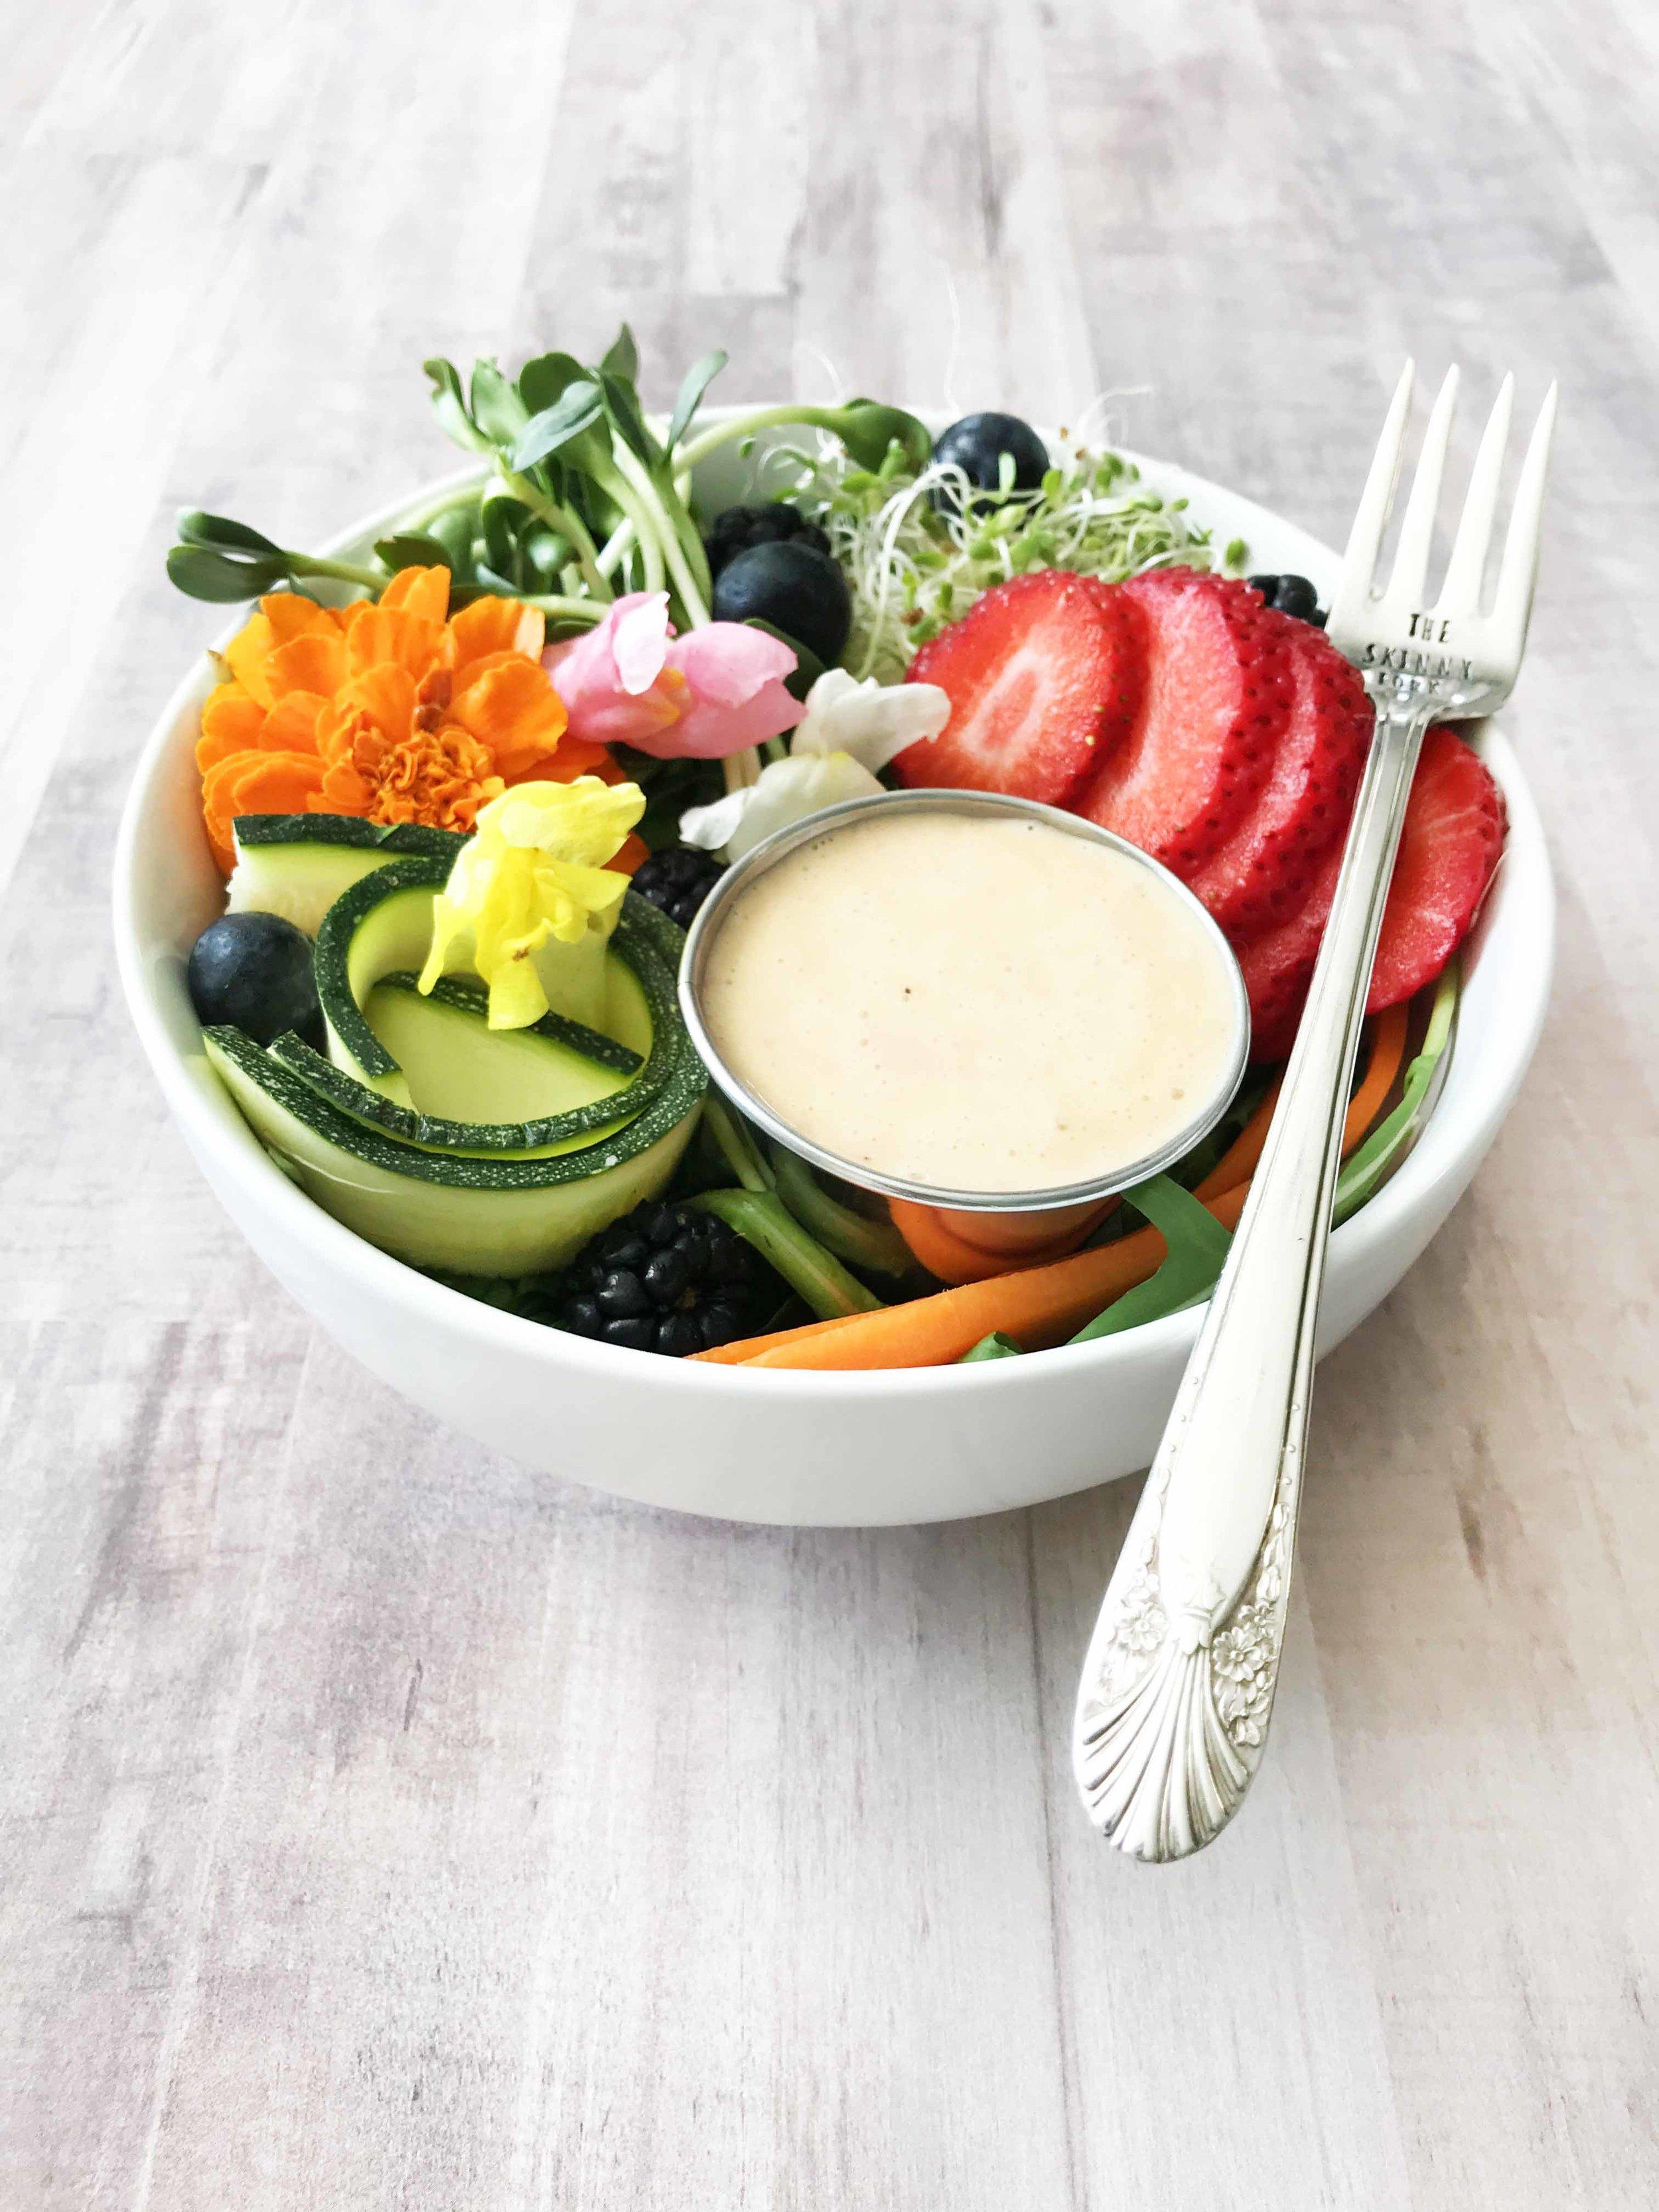 fairy-garden-salad4.jpg